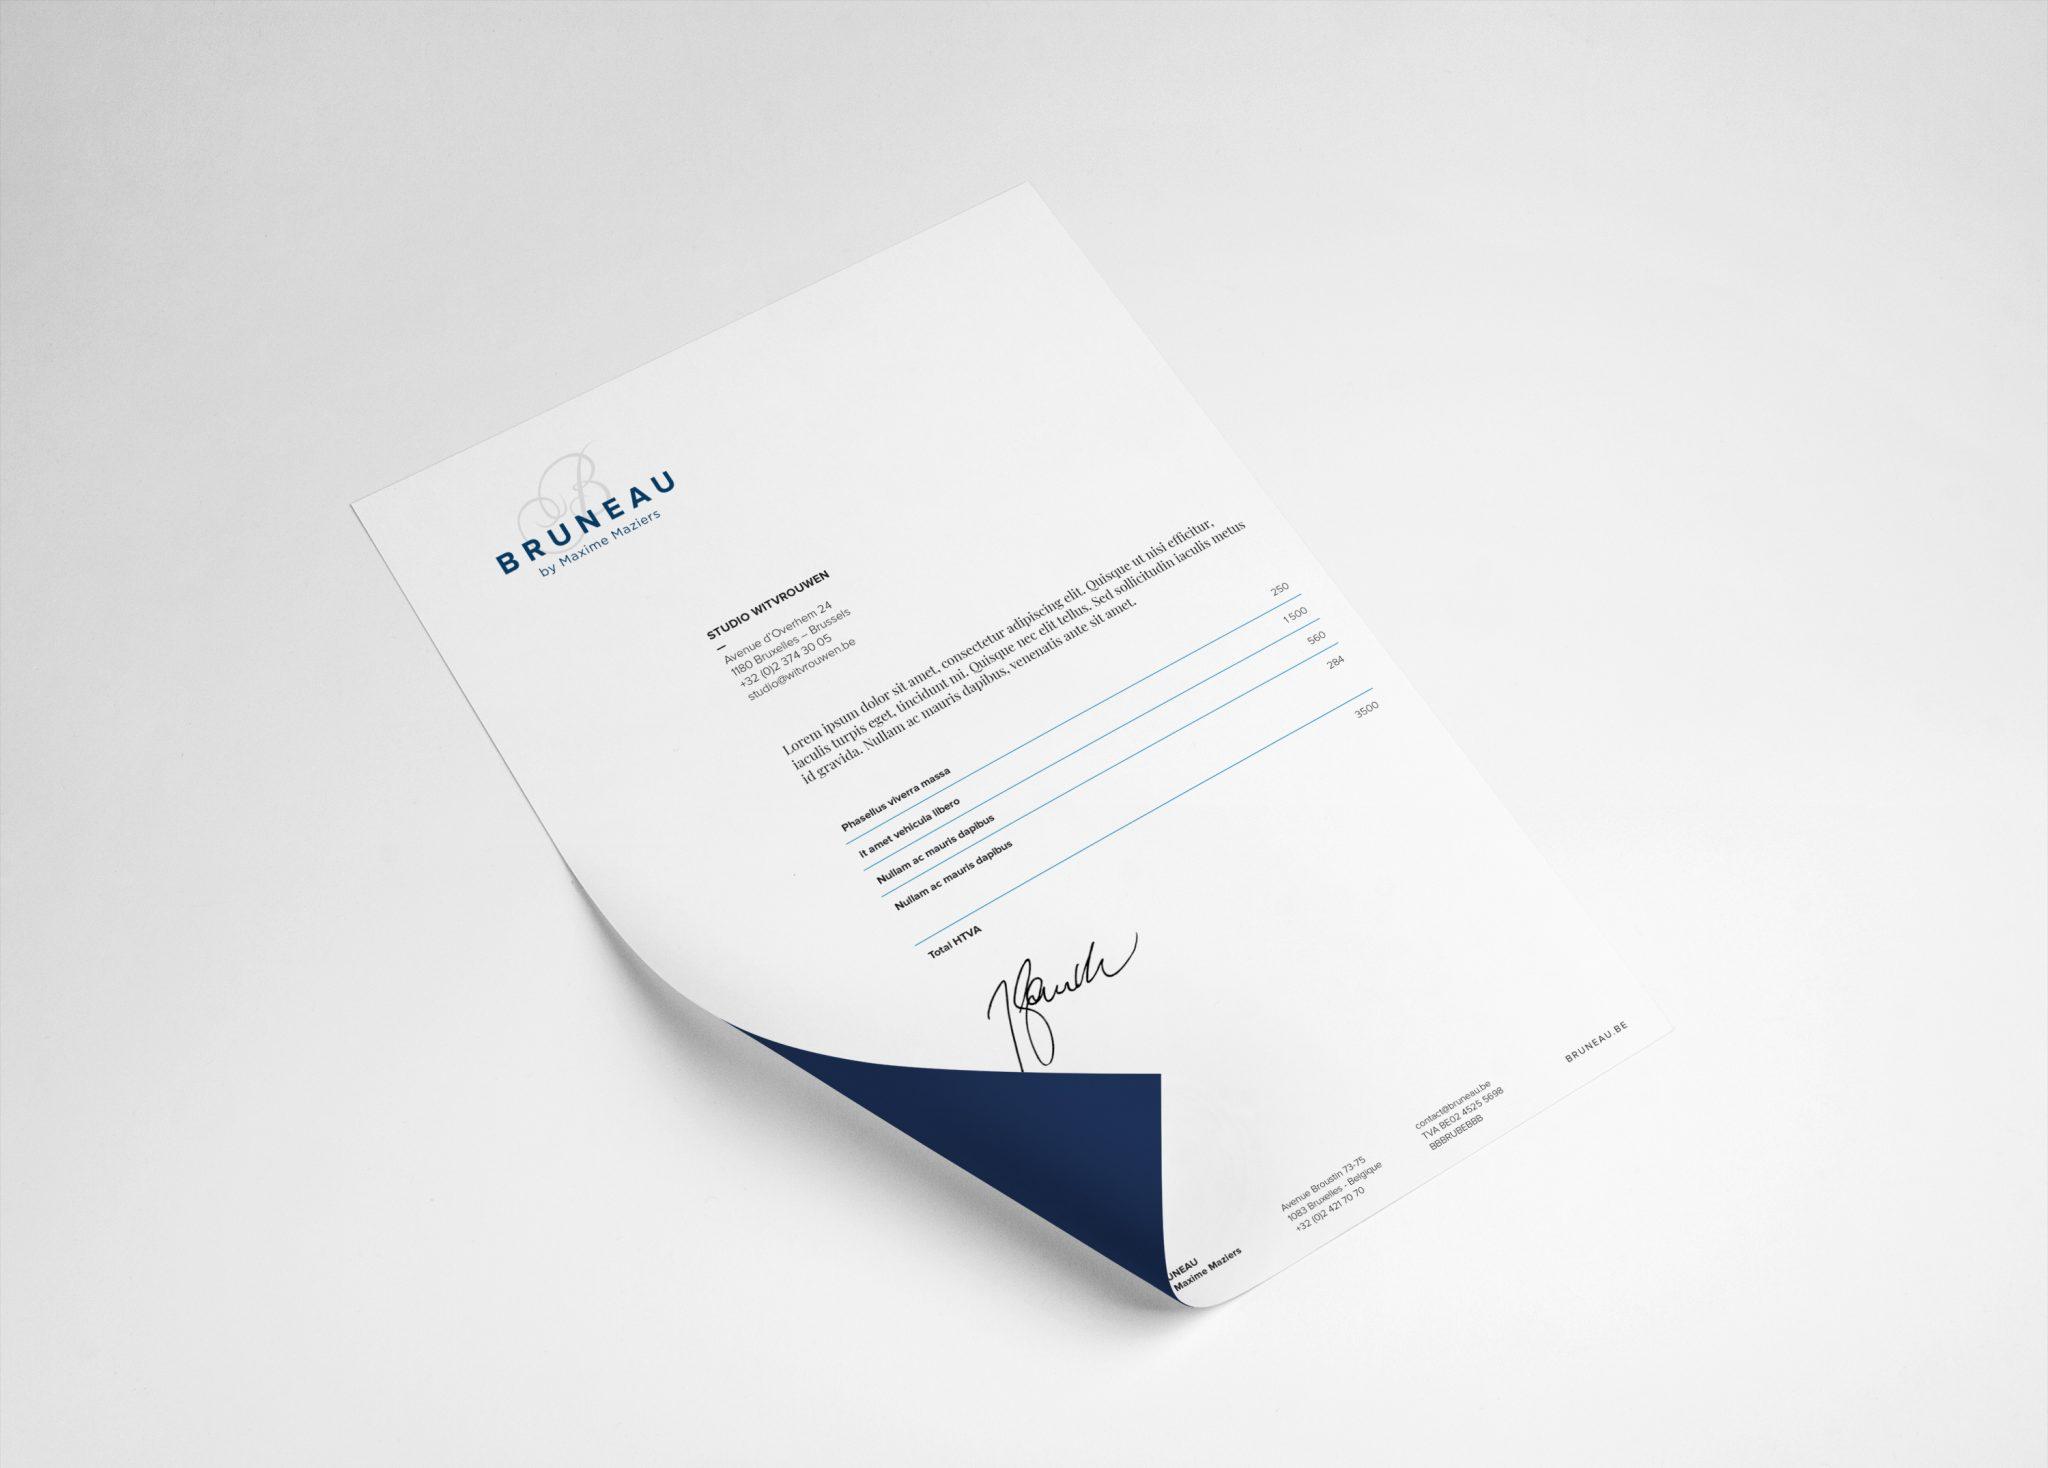 studio witvrouwen graphic design identity branding logotype logo Maxime Maziers chef restaurant layout